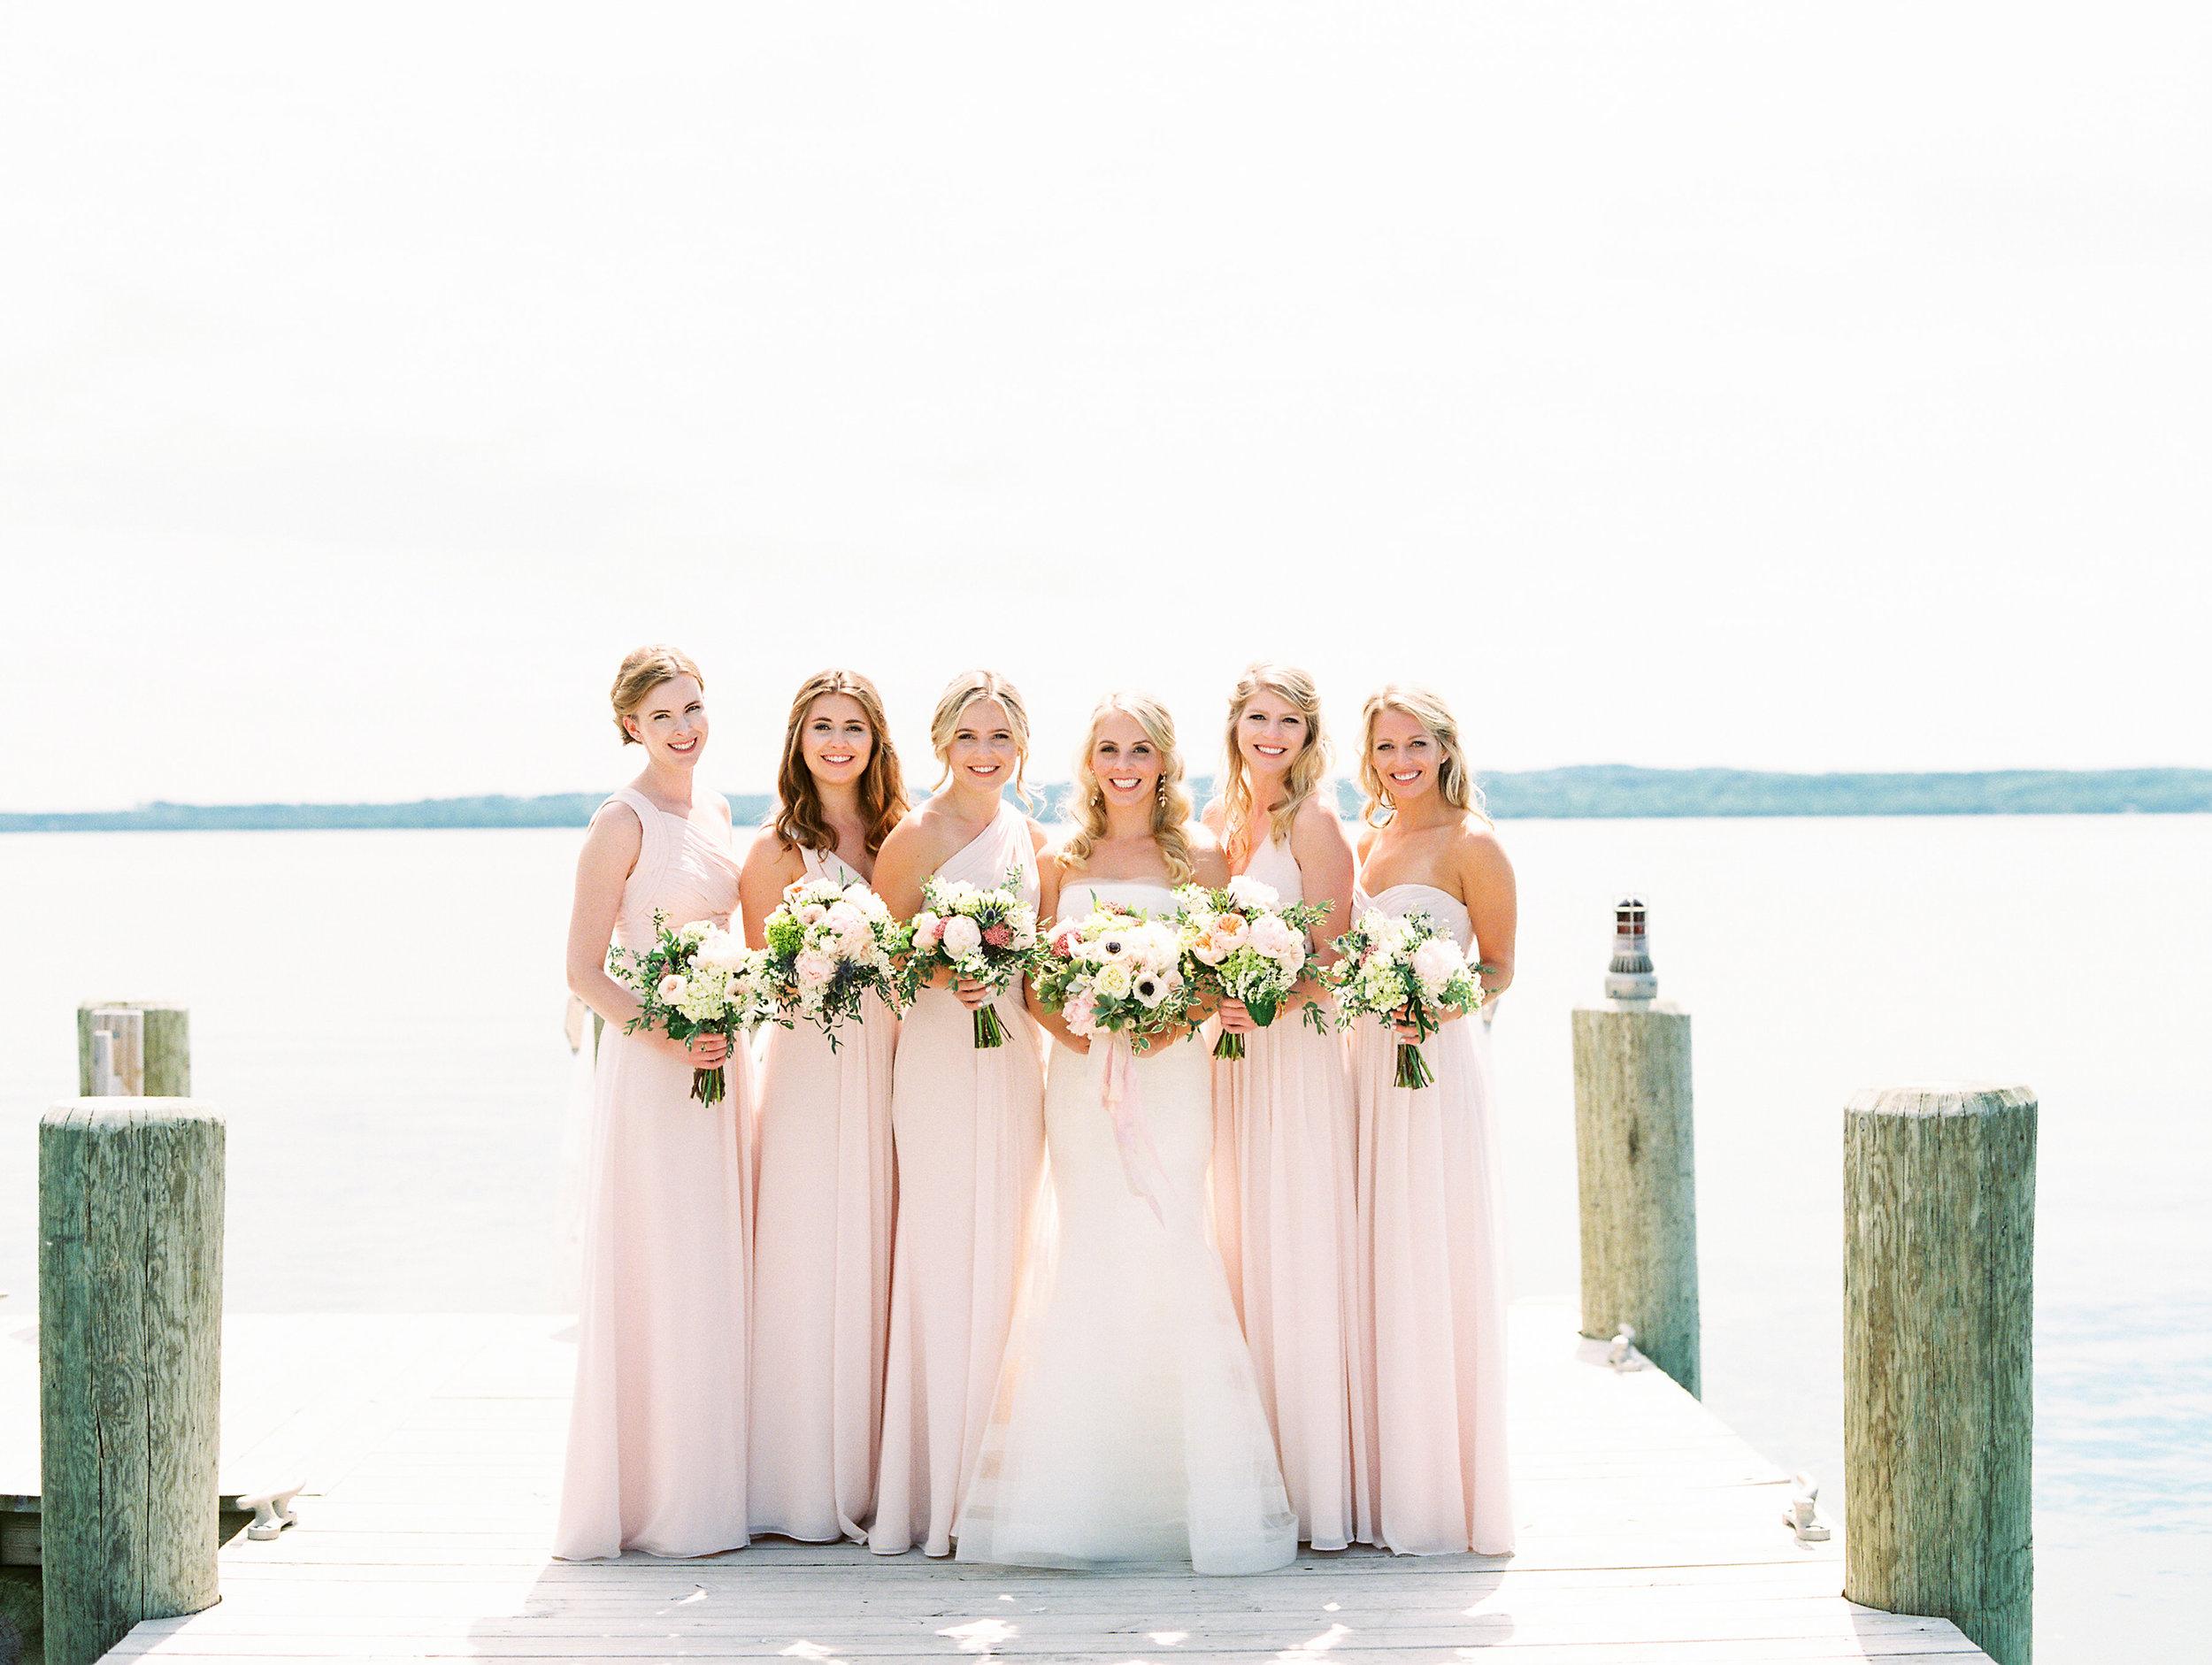 Coffman+Wedding+Bridal+Party-1.jpg